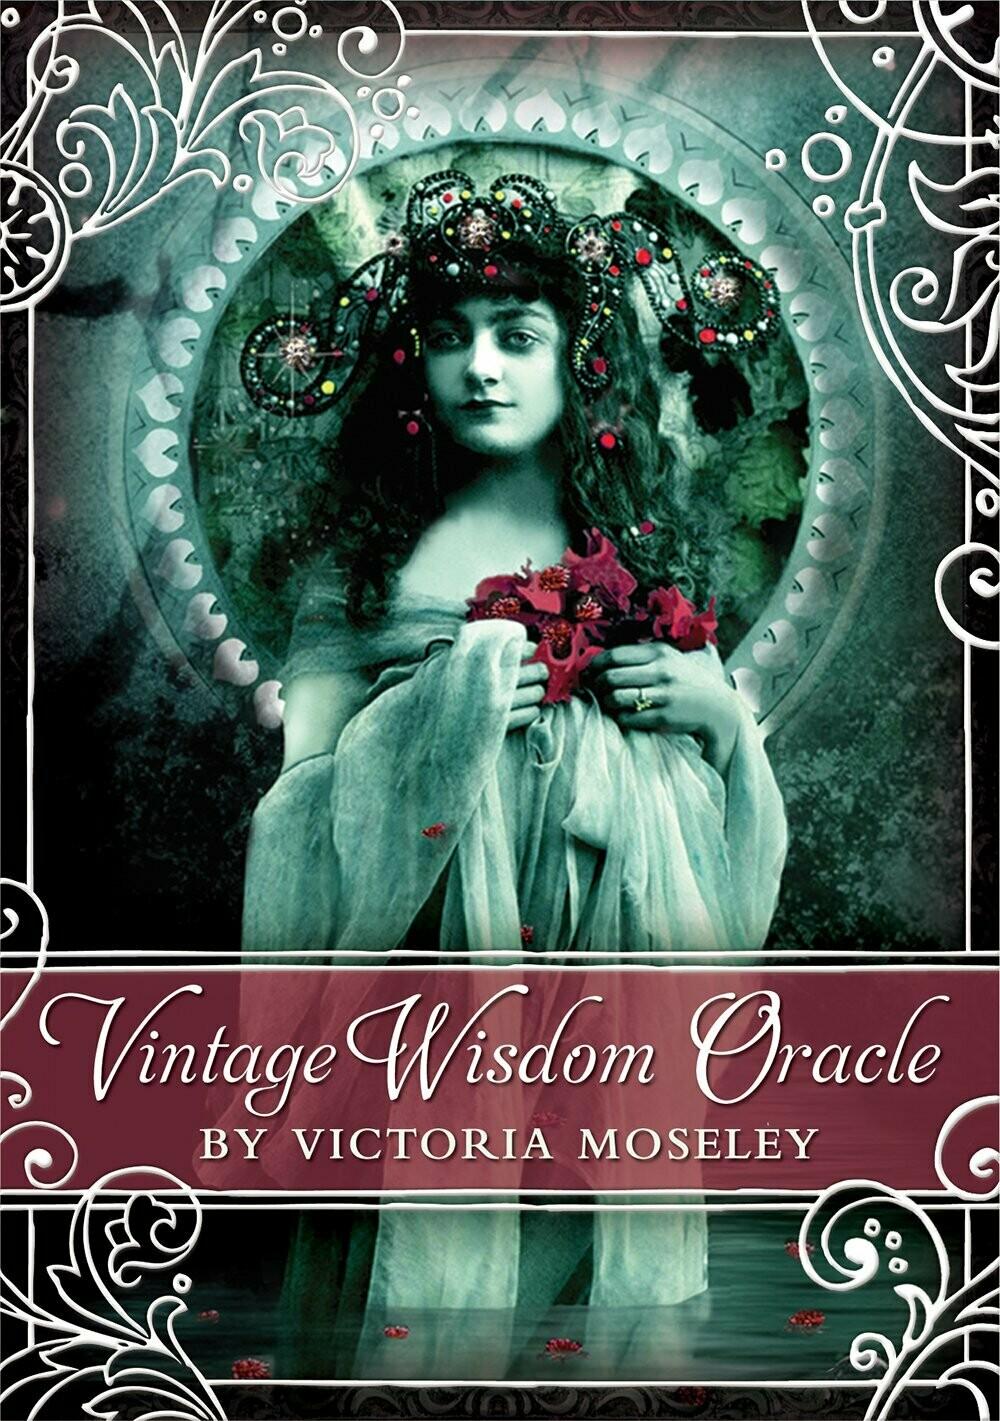 Vintage Wisdom Oracle by Victoria Moseley